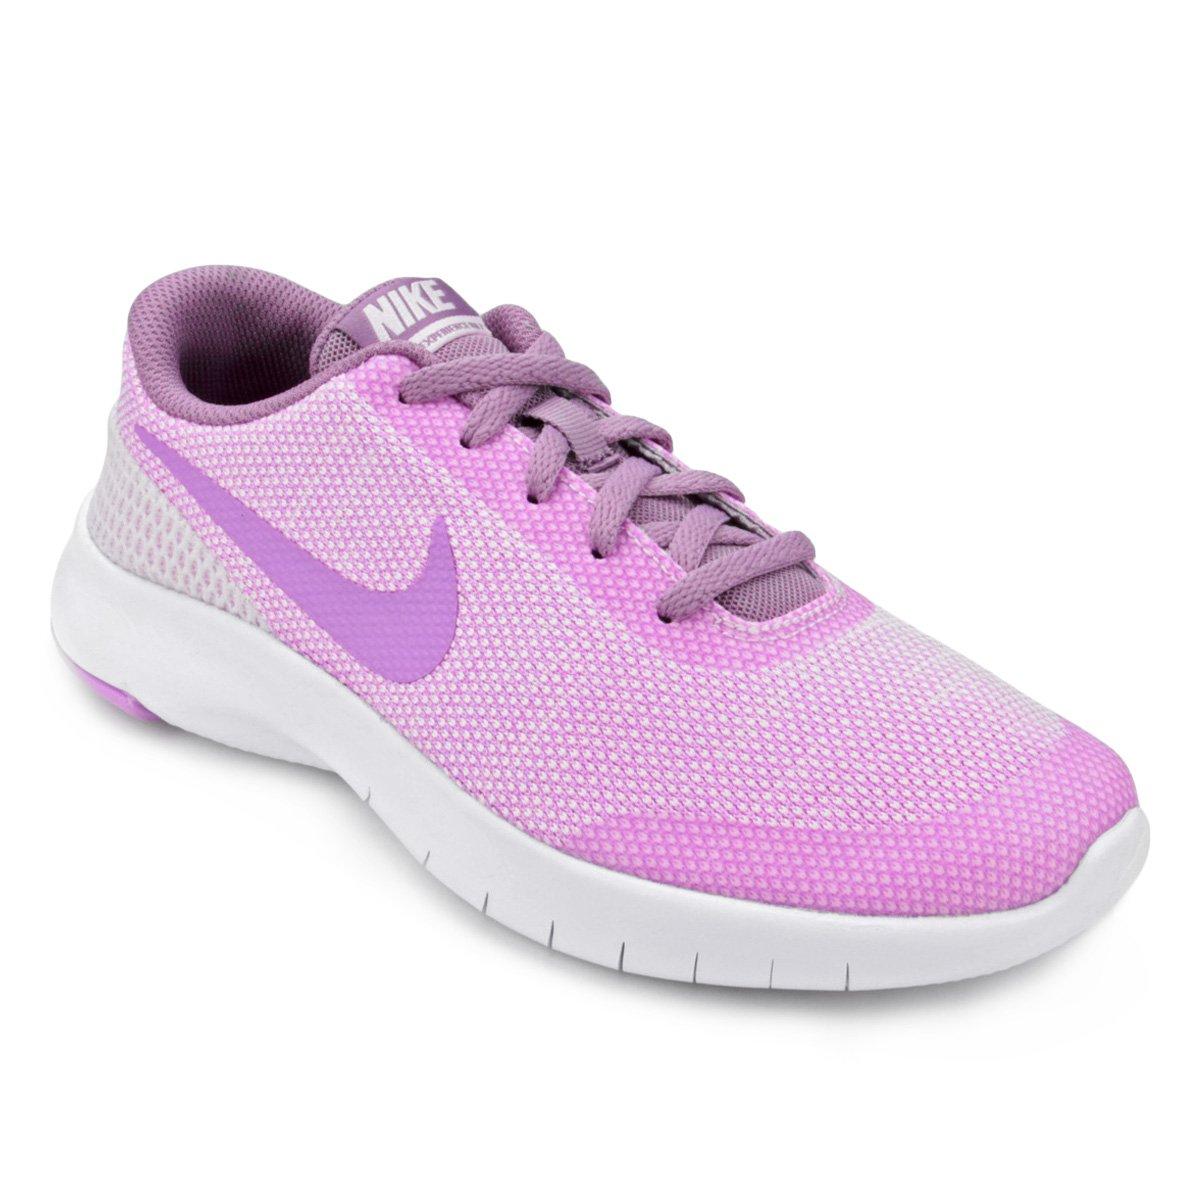 Tênis Infantil Nike Flex Experience Rn Feminino Lilás E Rosa